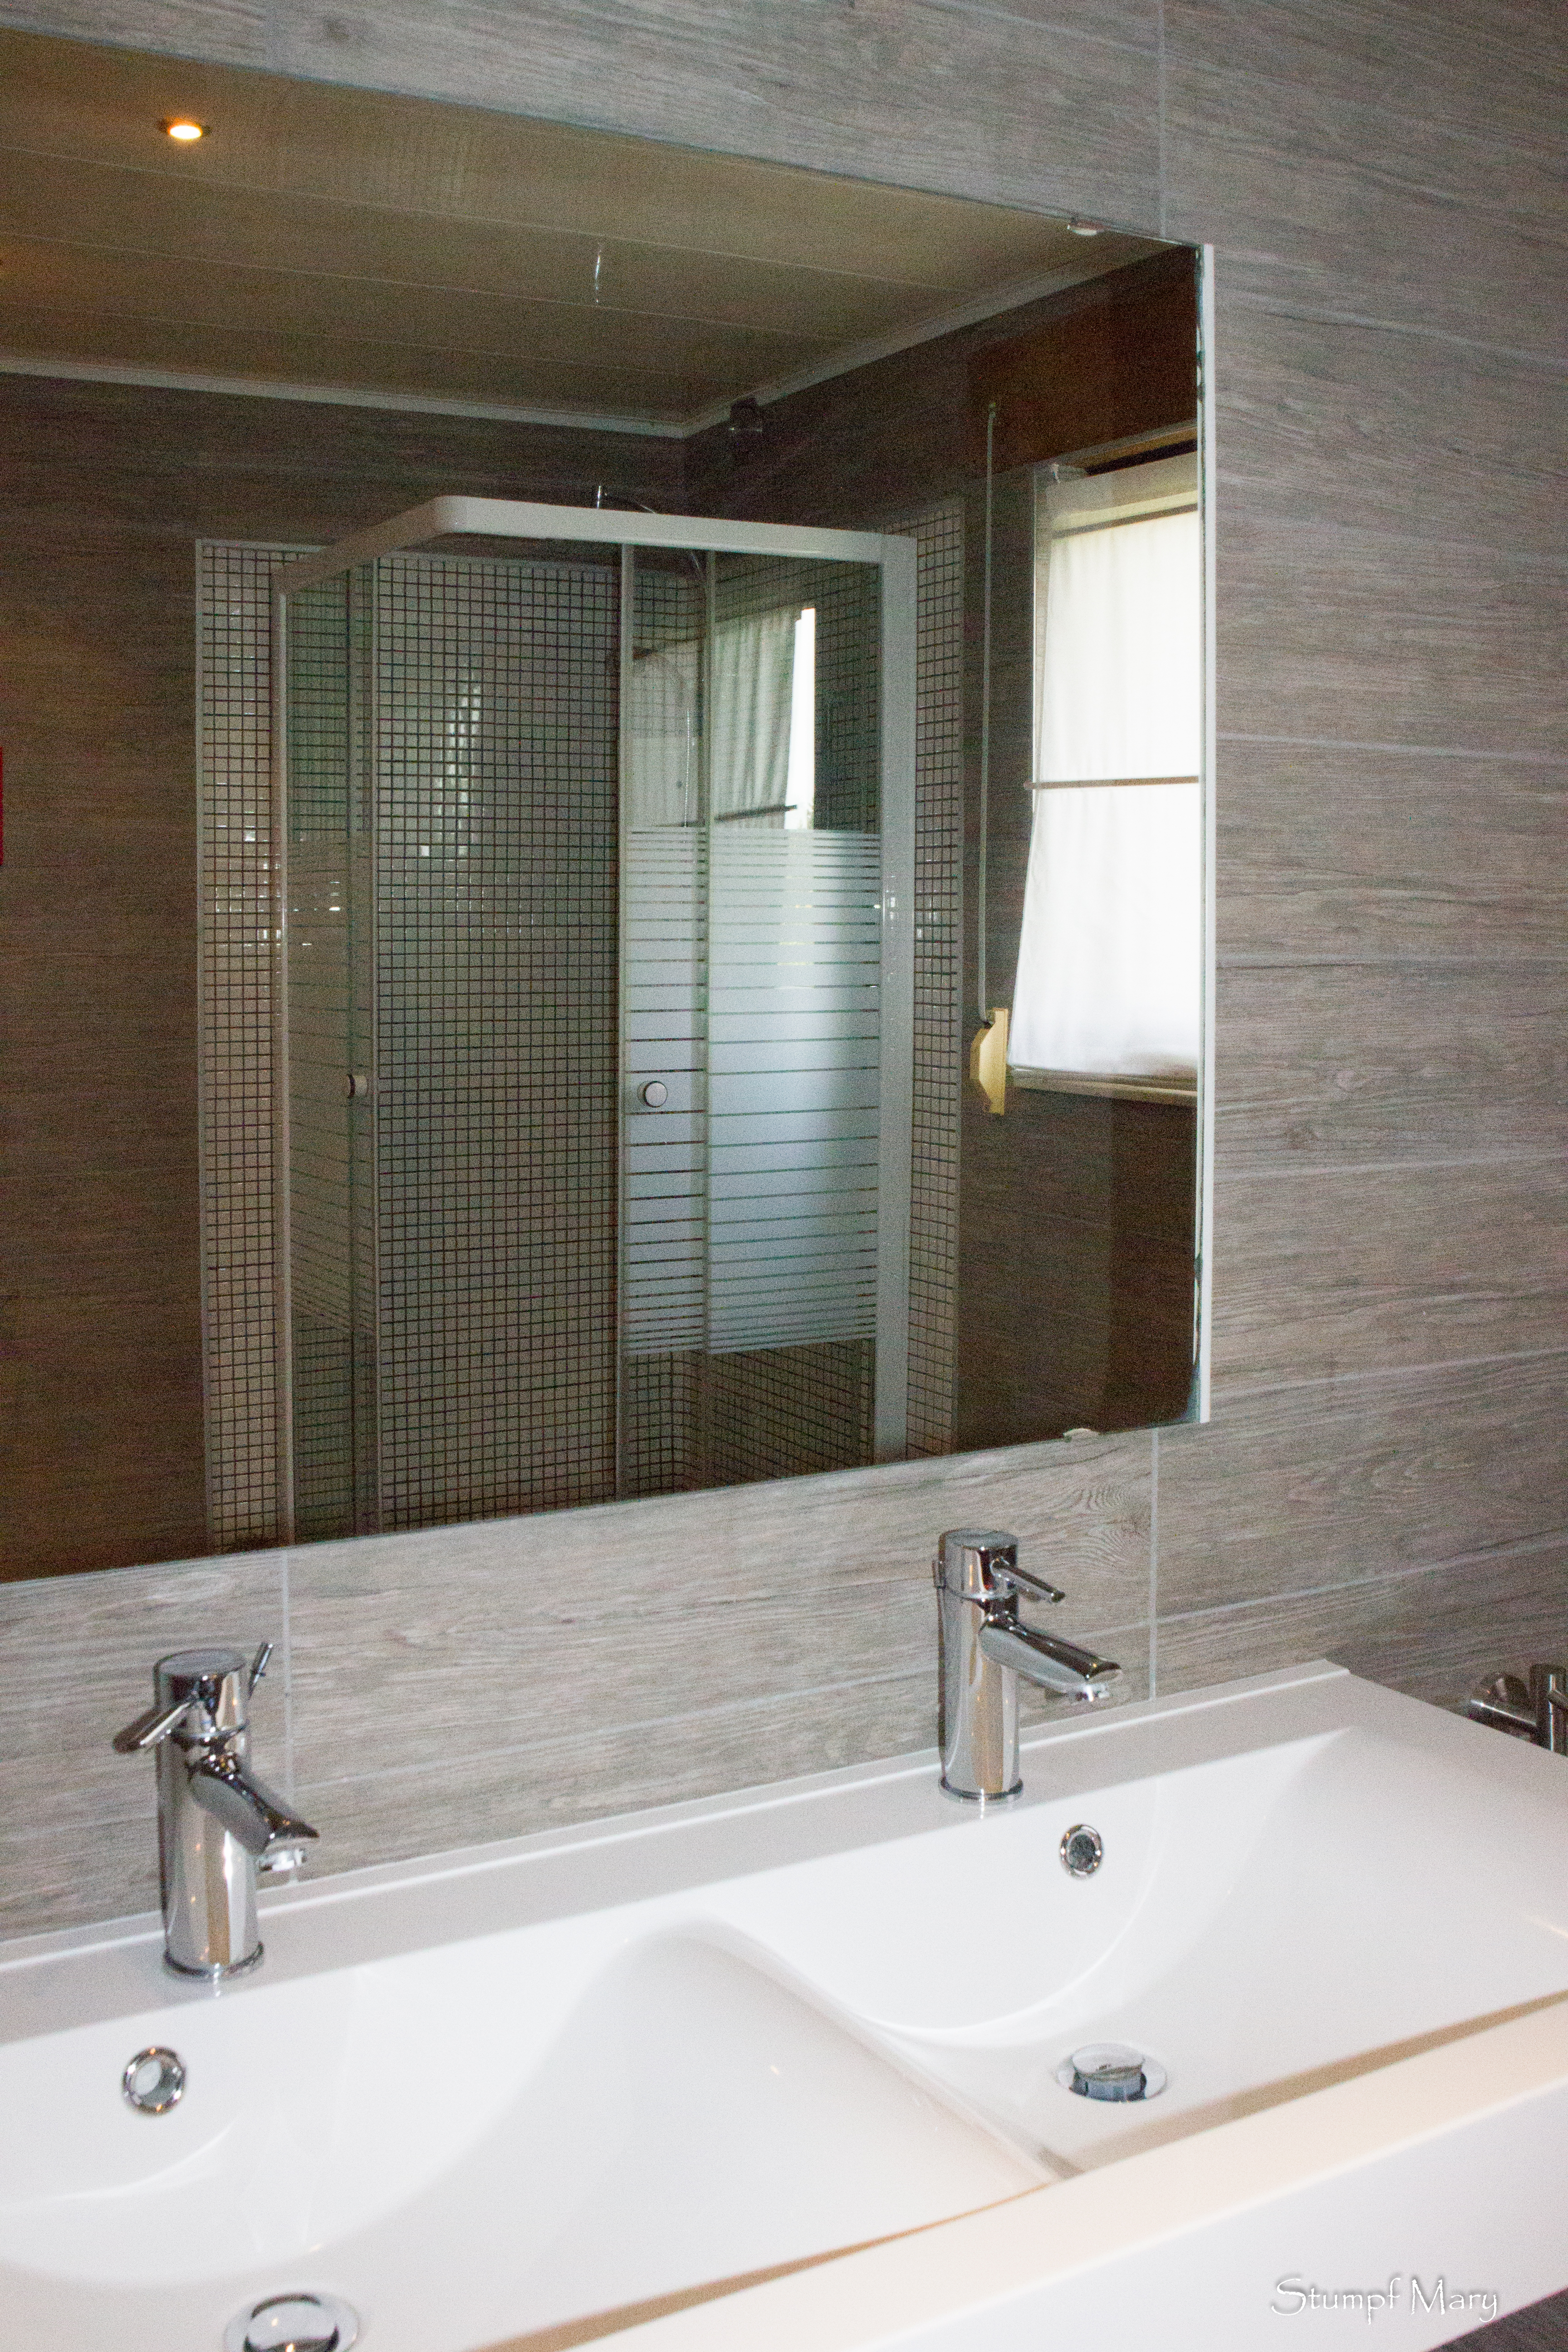 sdb-commune-lavabo(3).jpg